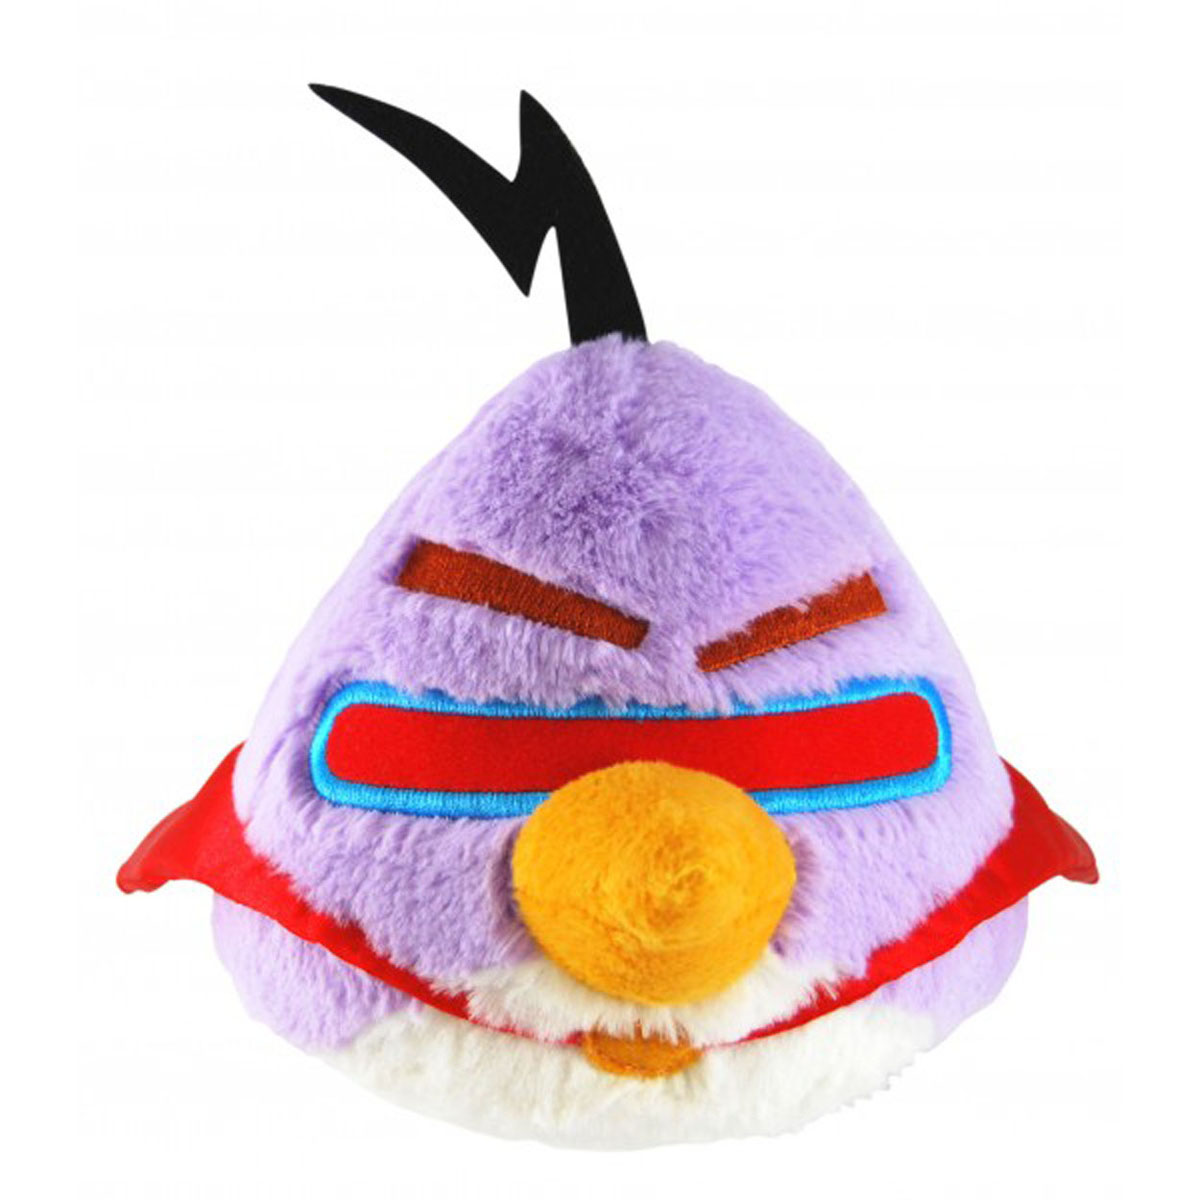 Мягкая игрушка Angry Birds Space, фиолетовая птица, со звуком, 40 см мягкая игрушка angry birds люк скайуокер 12 см star wars